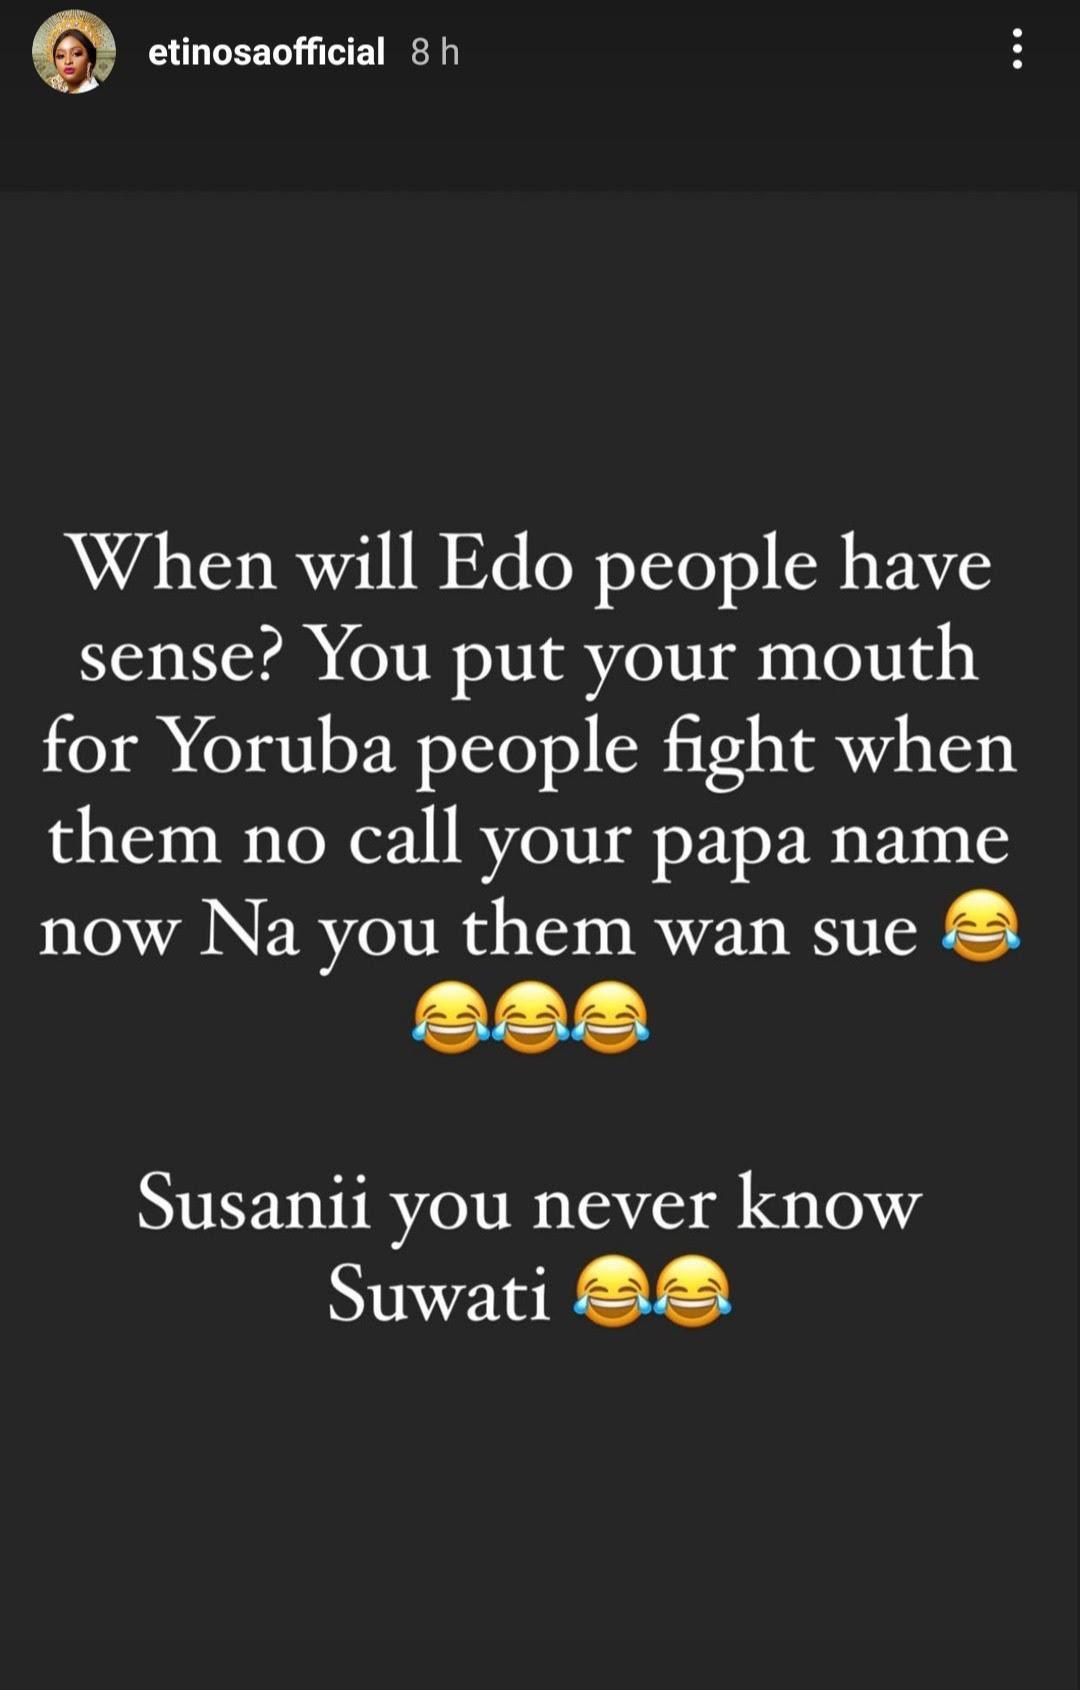 """When will Edo people have sense"" - Etinosa blast Davido's aide over involvement in Dj Cuppy, Zlatan issue"